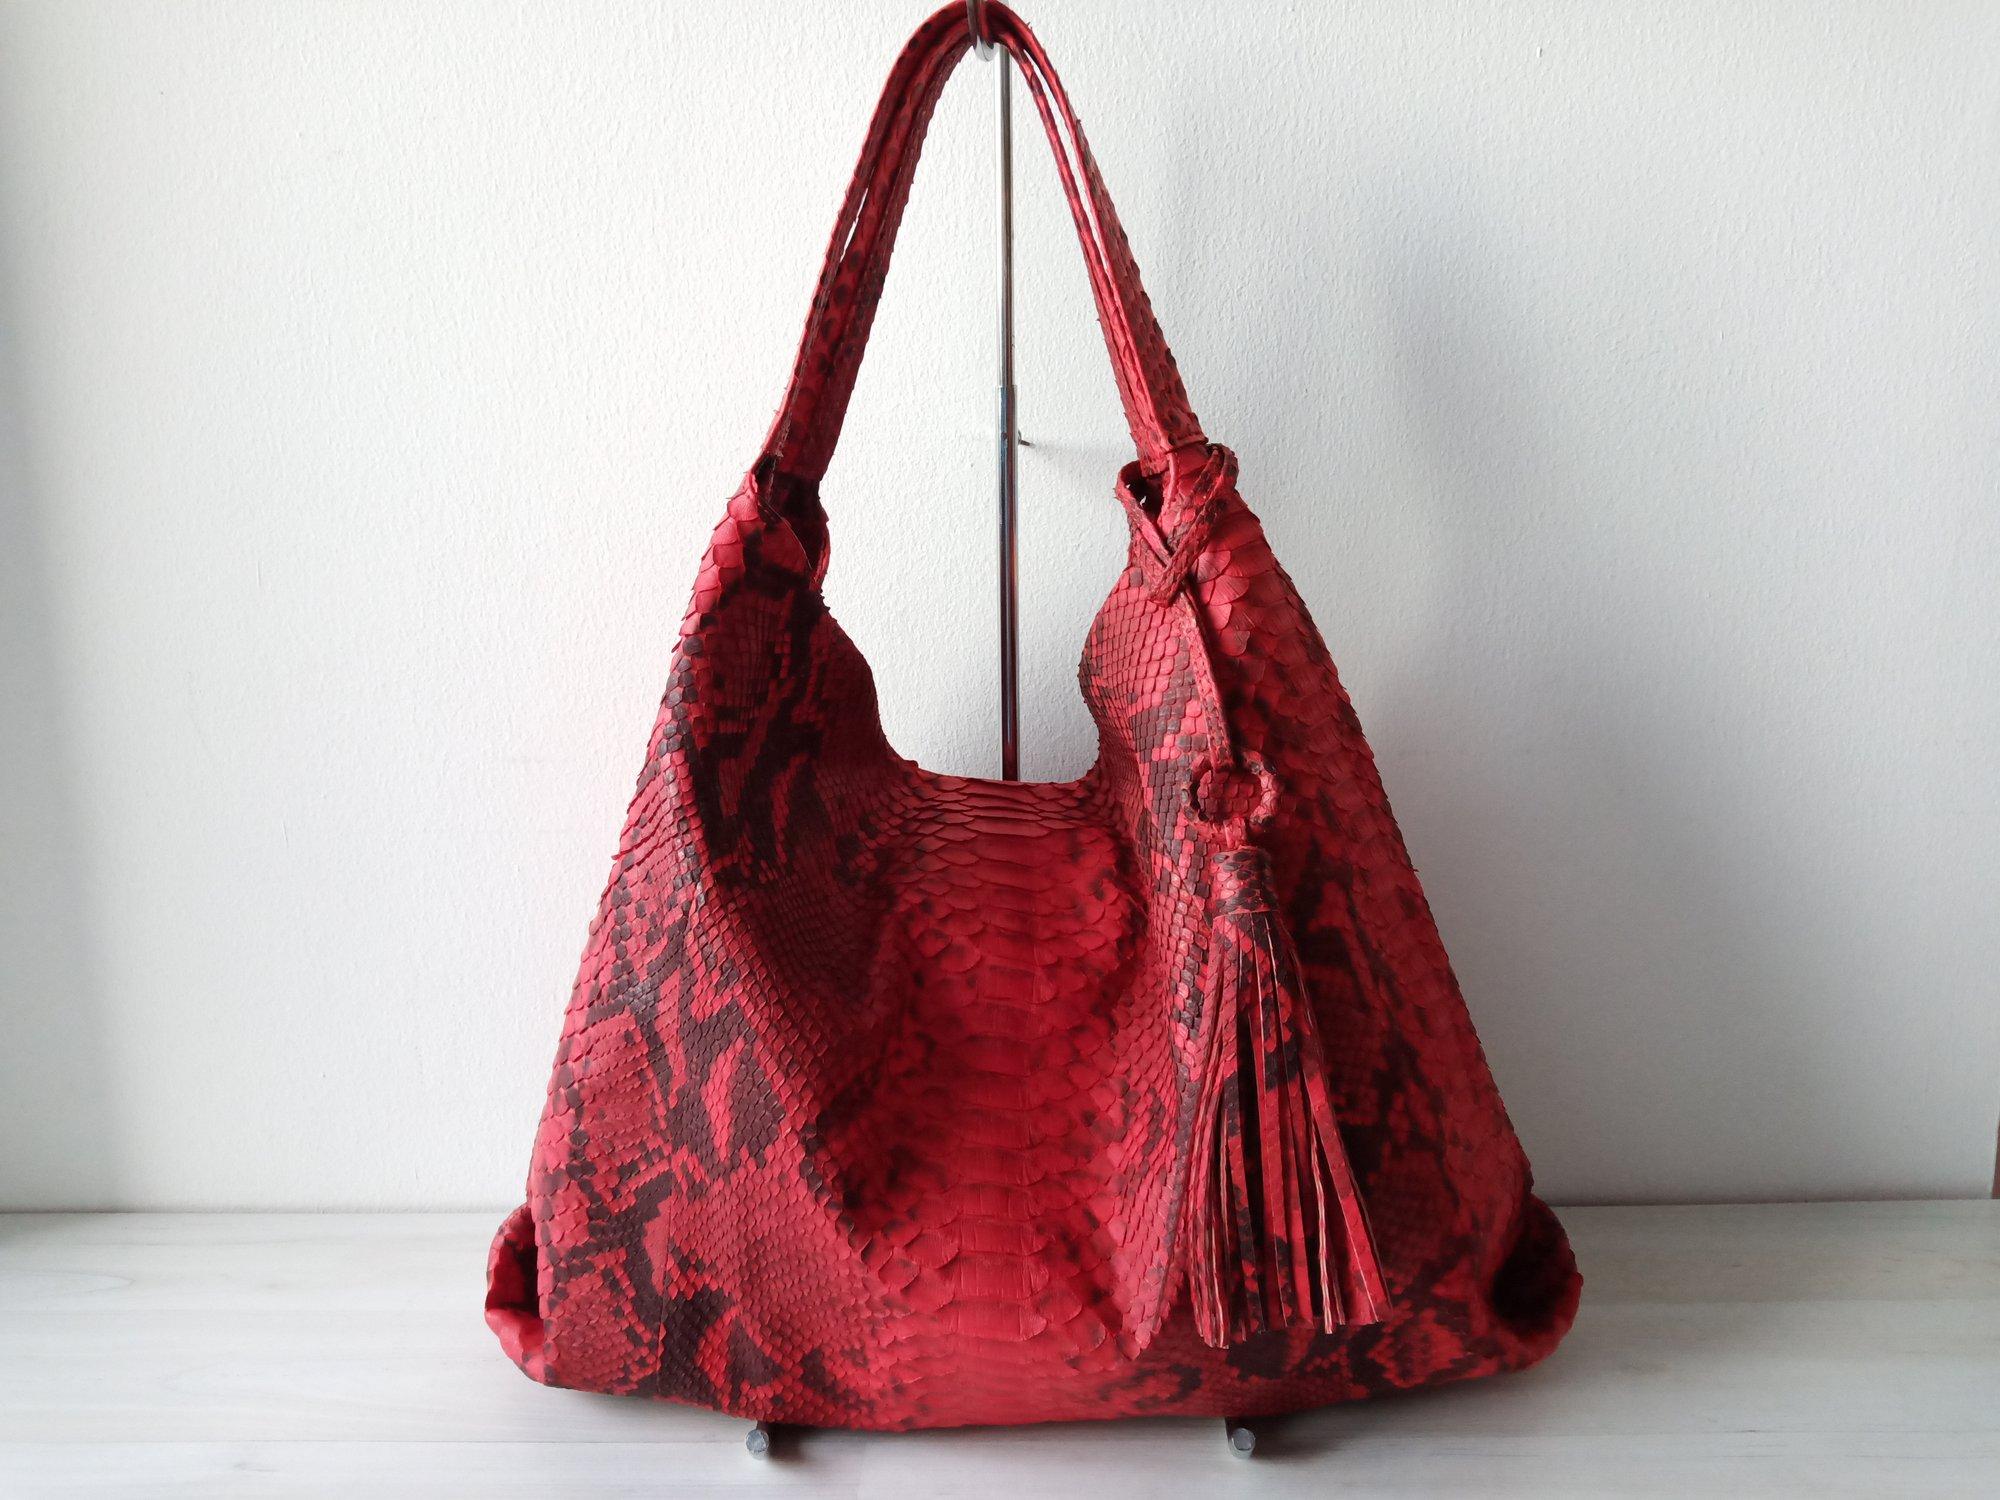 da01d589d83e ... Bag  Image of BURLA Python Leather Women s Shoulder Hobo ...